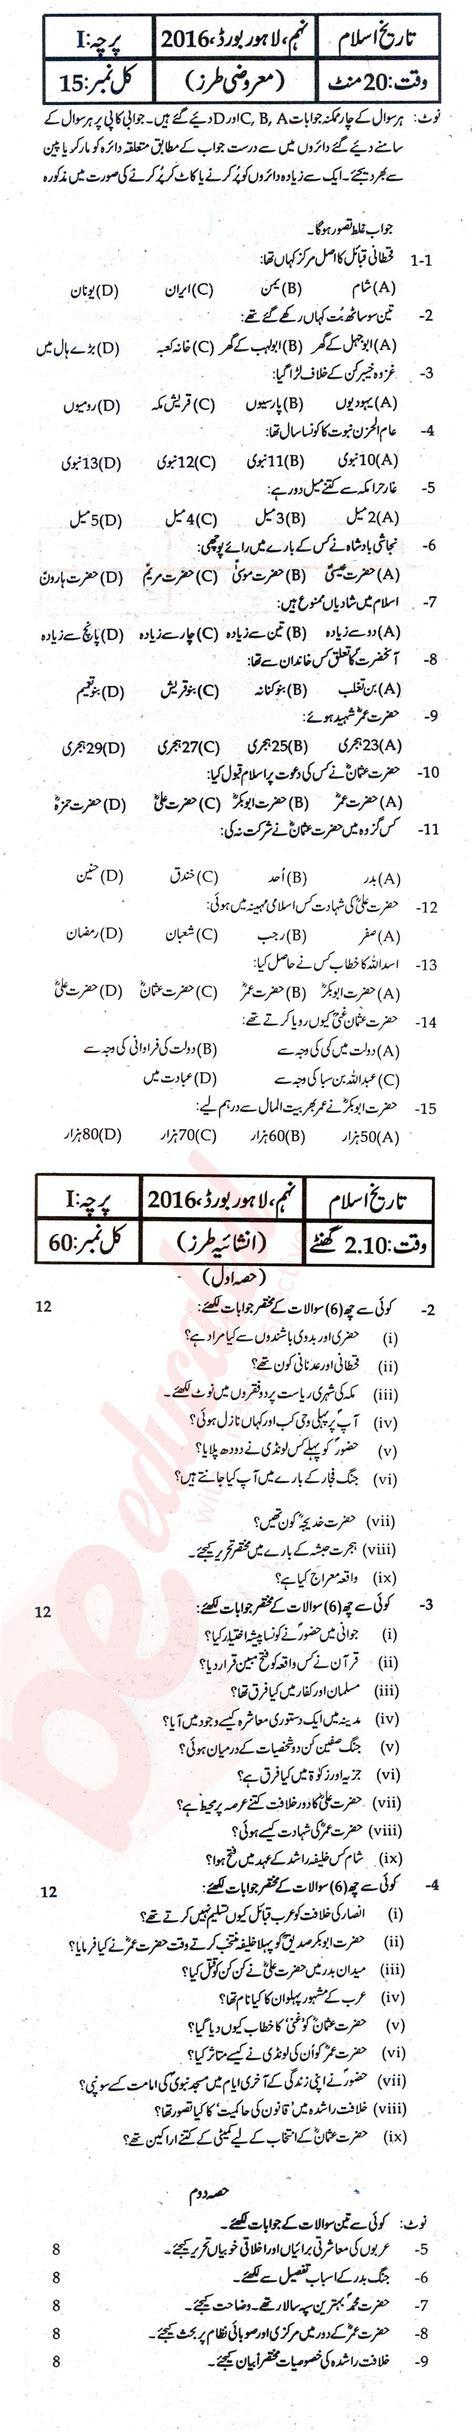 new year history in urdu islamic history subject bise lahore 9th class urdu medium